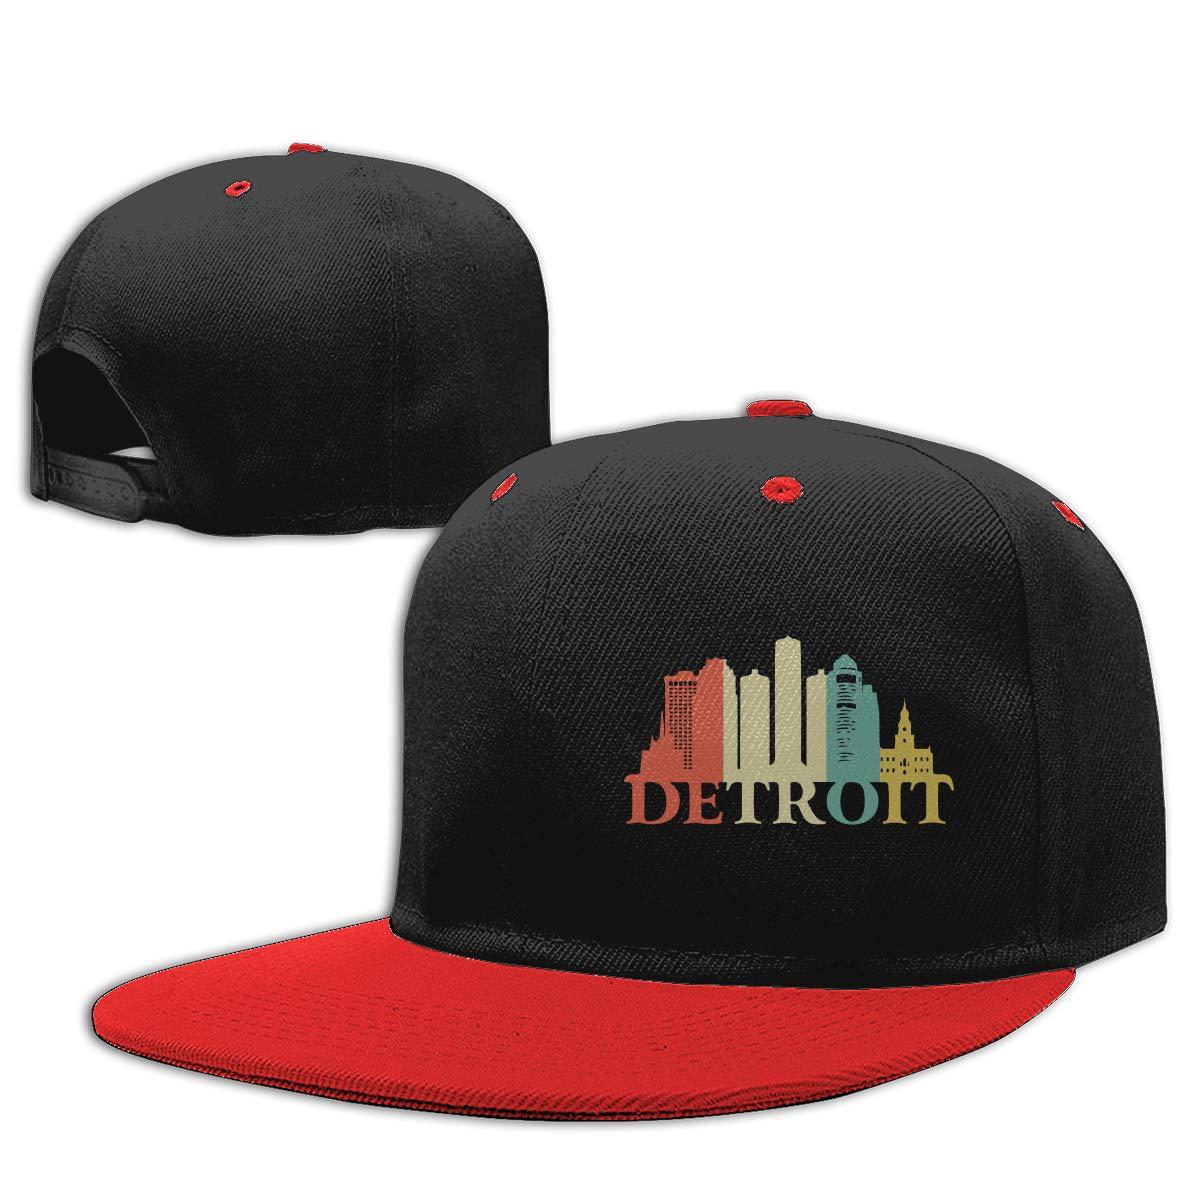 Retro Detroit Michigan Cityscape Printed Flat Bill Baseball Caps NMG-01 Men Womens Hiphop Cap